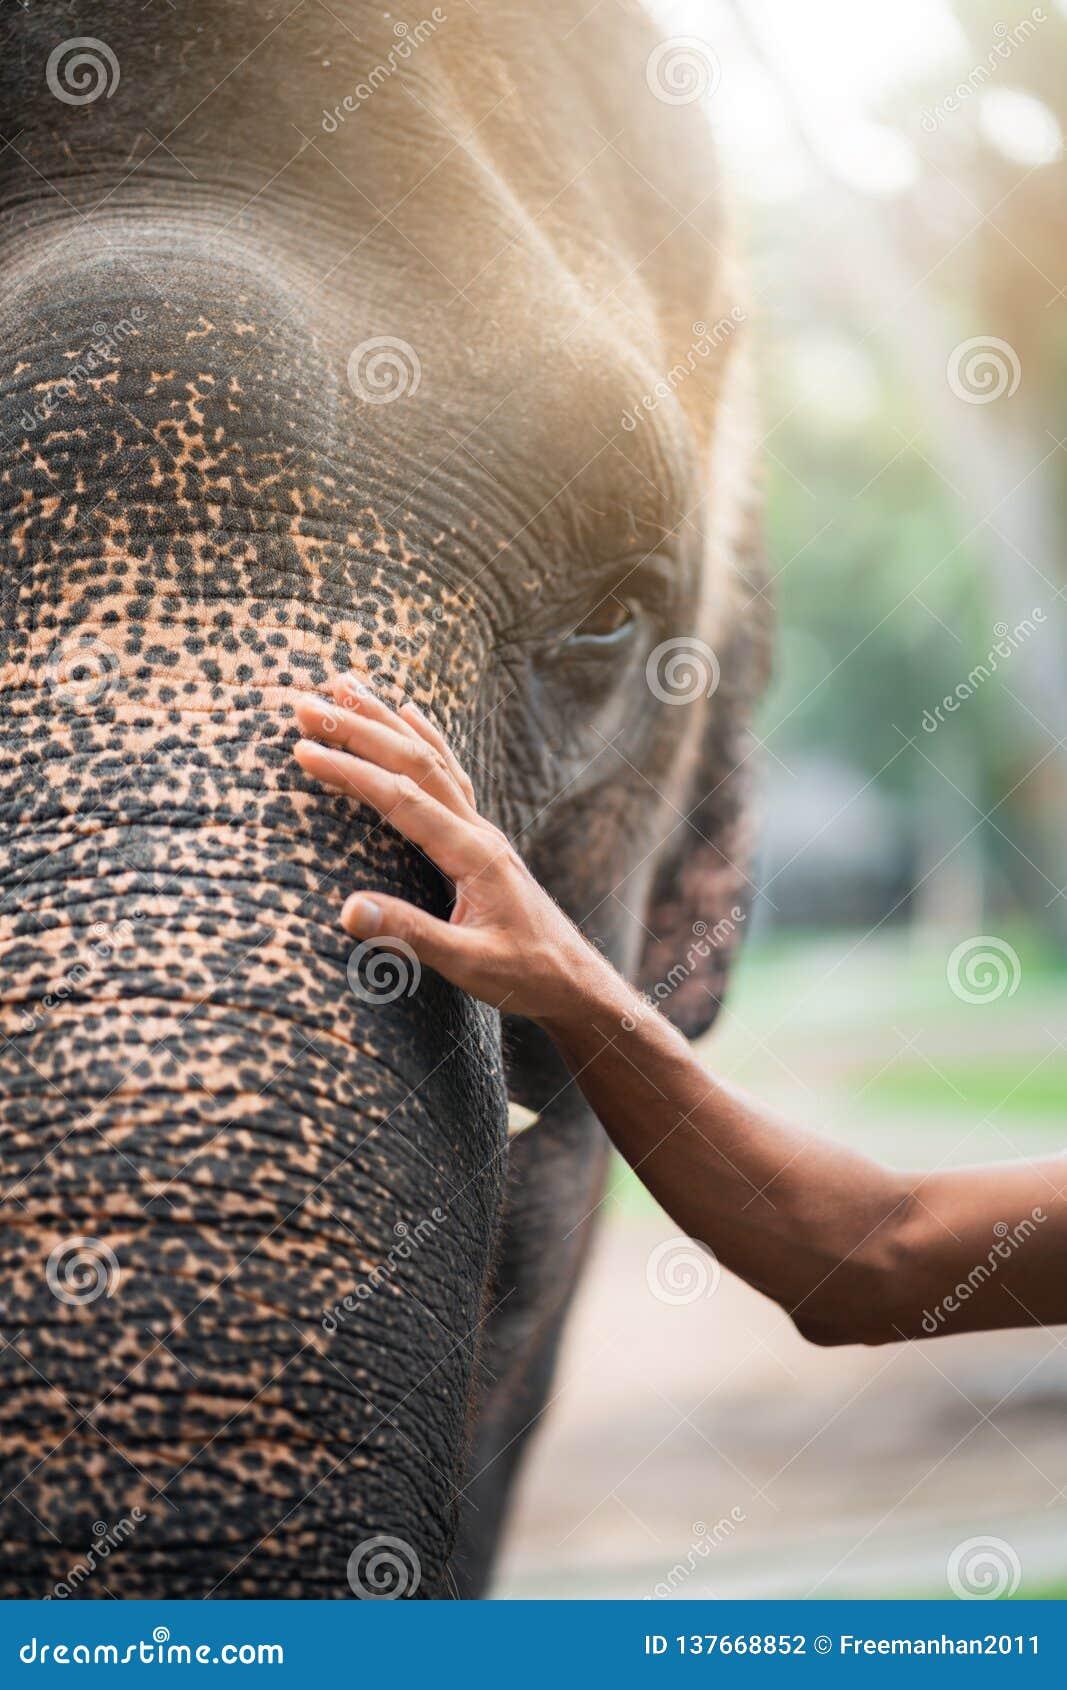 Mannens hand på elefantens huvud begreppet av kamratskap och omsorg ton